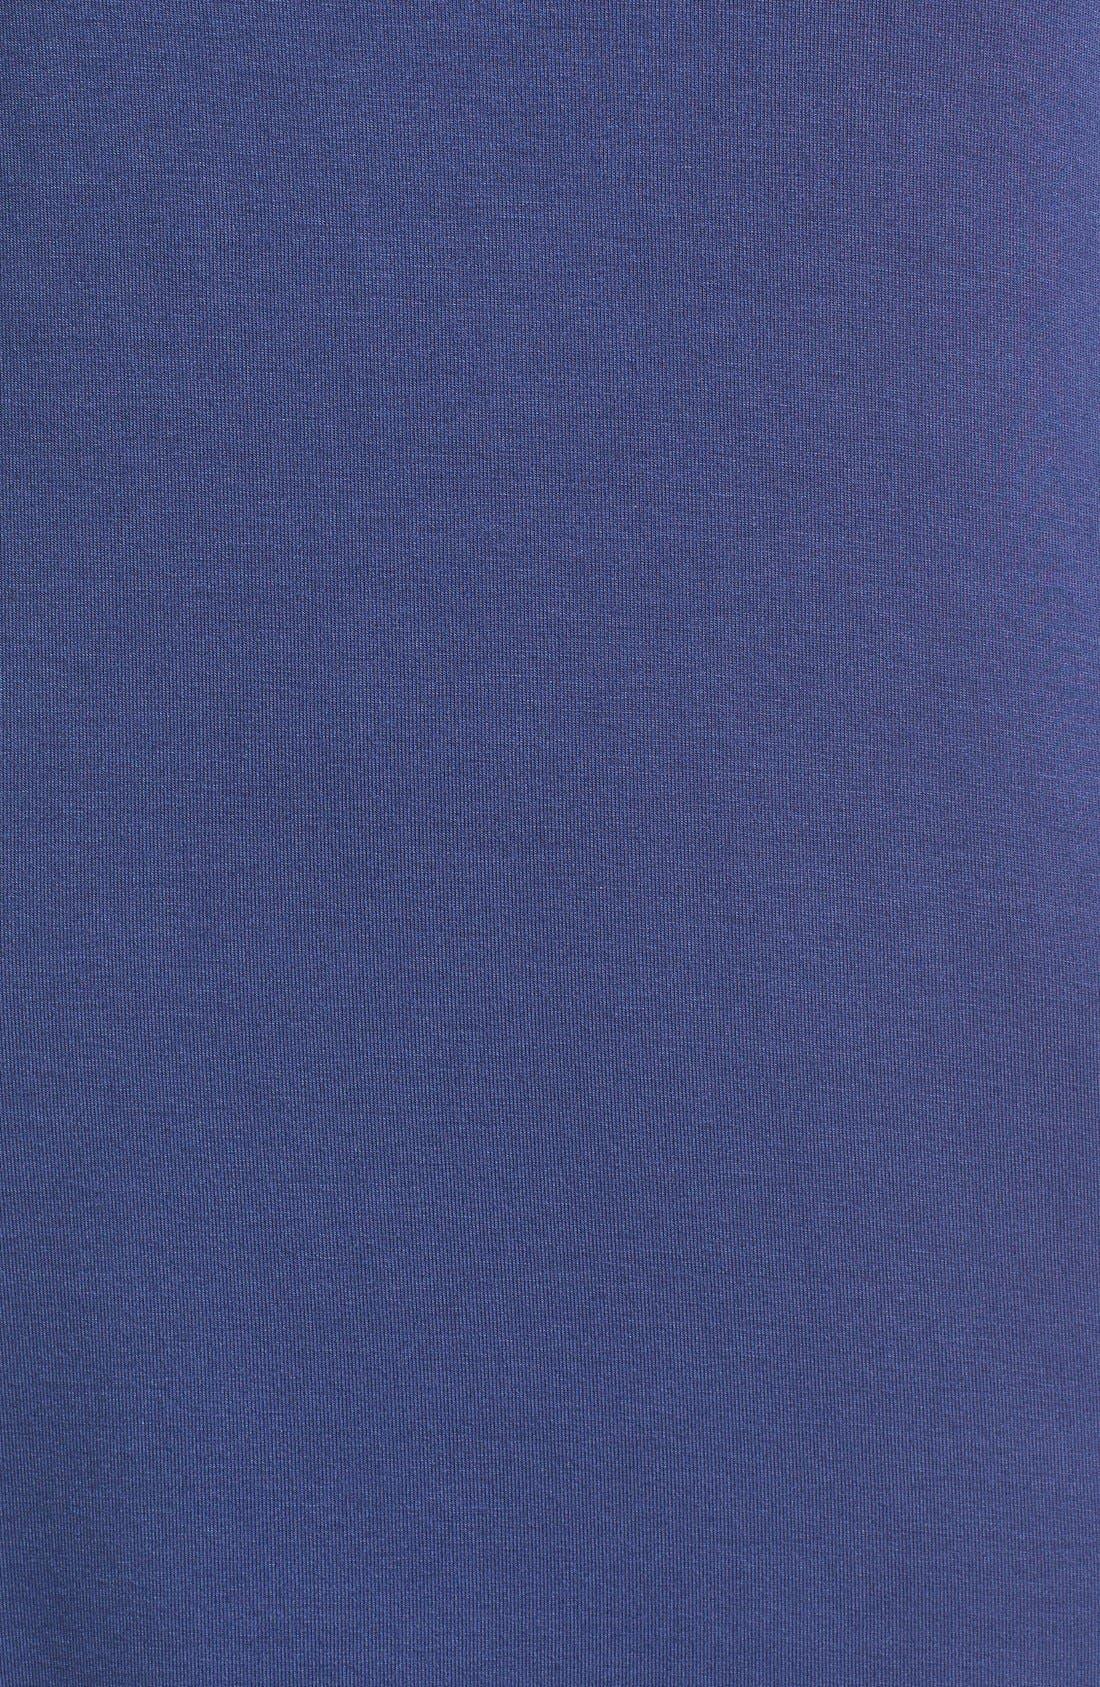 Cowl Neck Shift Dress,                             Alternate thumbnail 63, color,